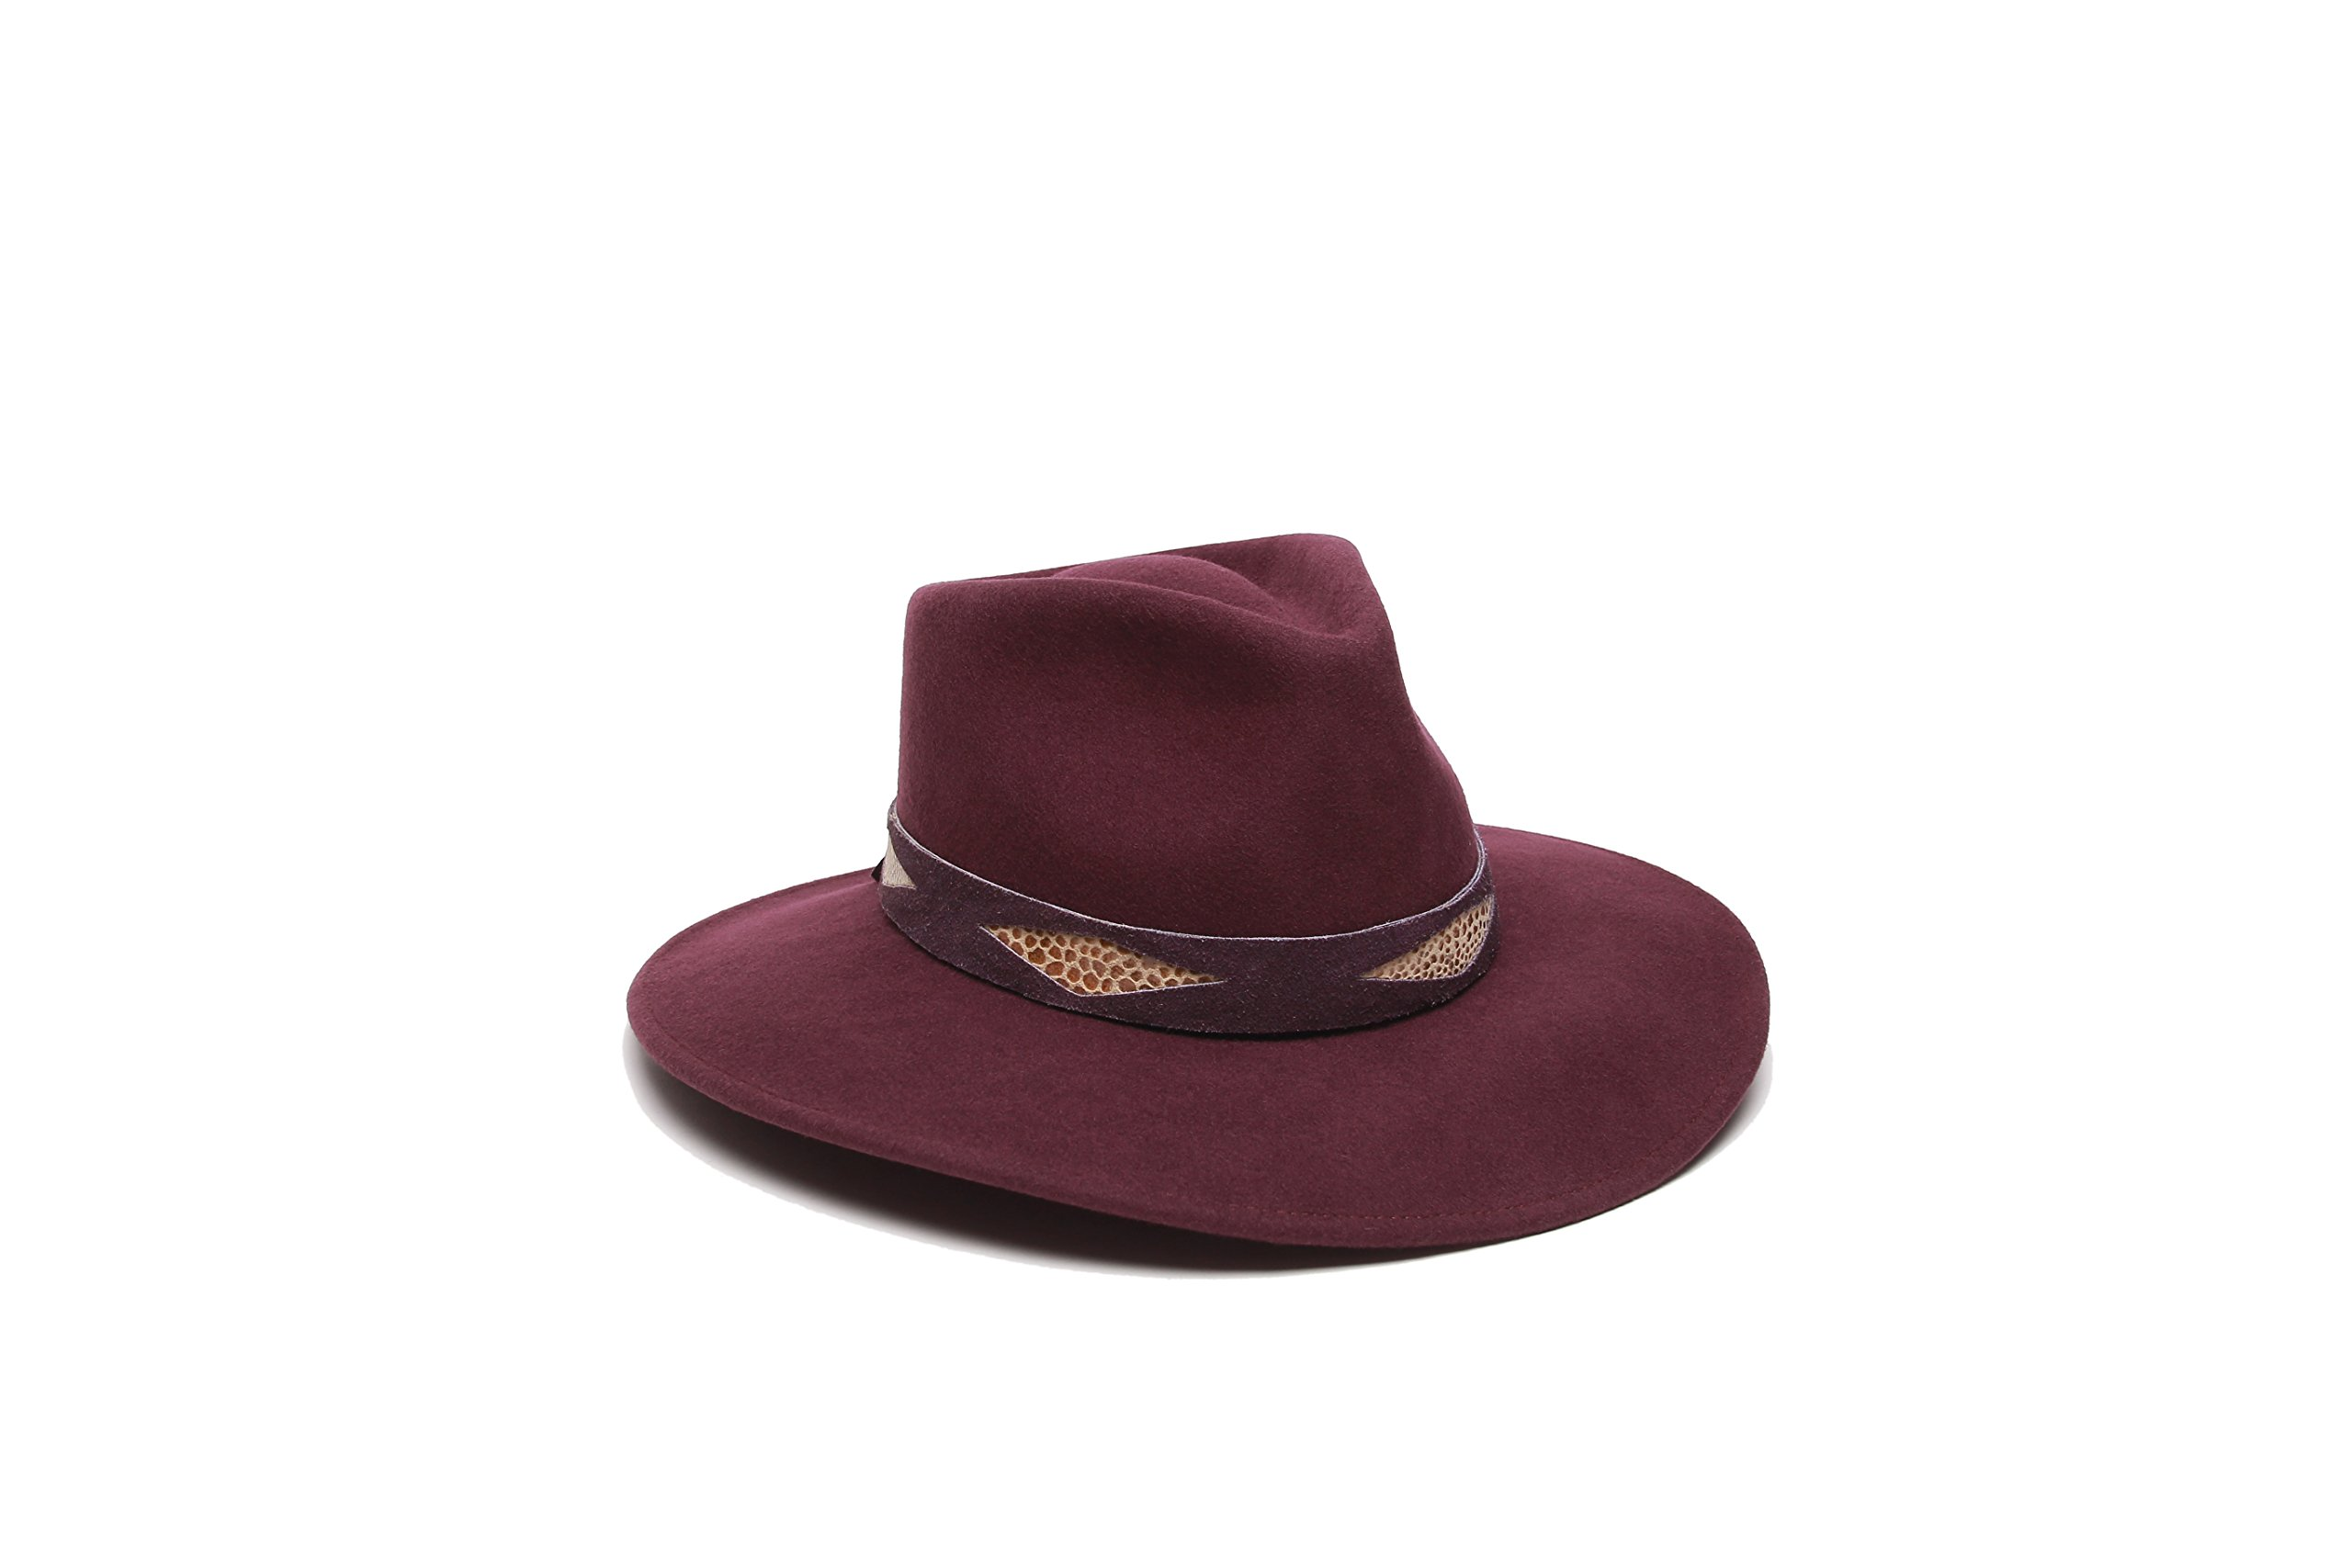 'ale by alessandra Women's Cobra Adjustable Felt Hat with Suede Trim, Bordeaux, Adjustable Head Size